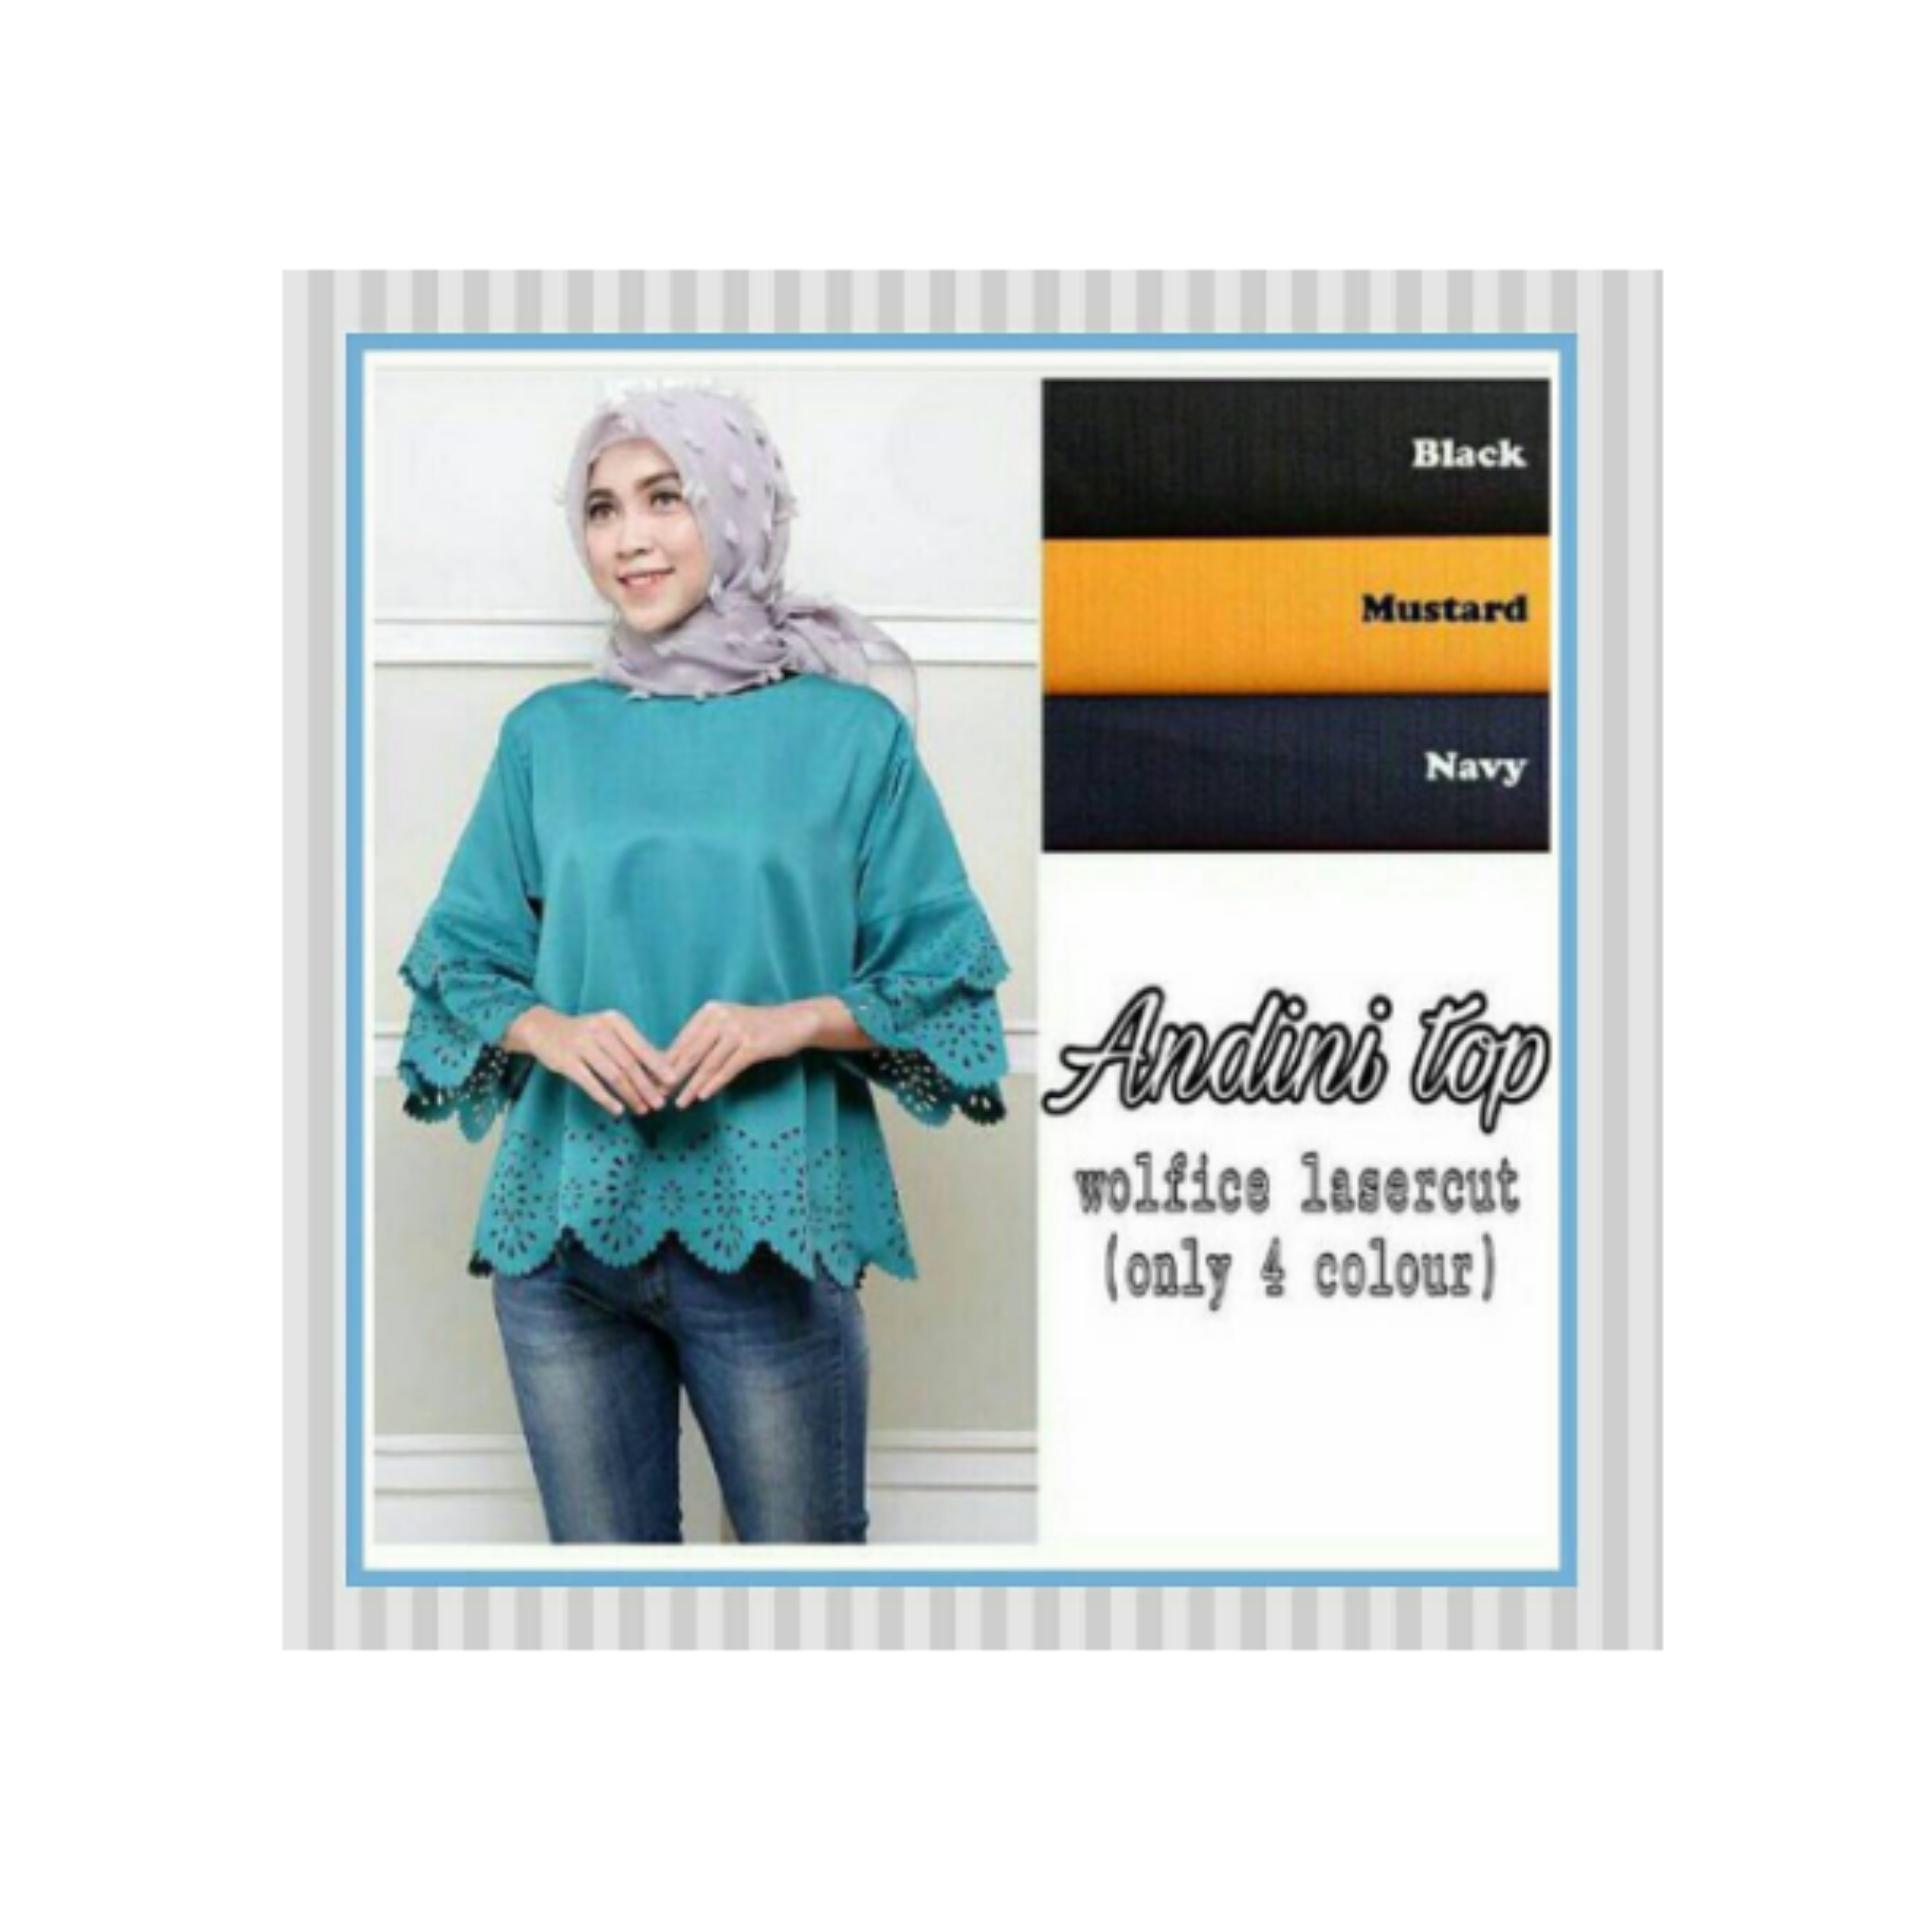 ... Maxi Fashion Baju Wanita Narcissus Syari Dapat Jilbab. Source · Flash Sale Grosir Baju Atasan Muslim Wanita Hijab Murah dan Terbaru / AndiniTop